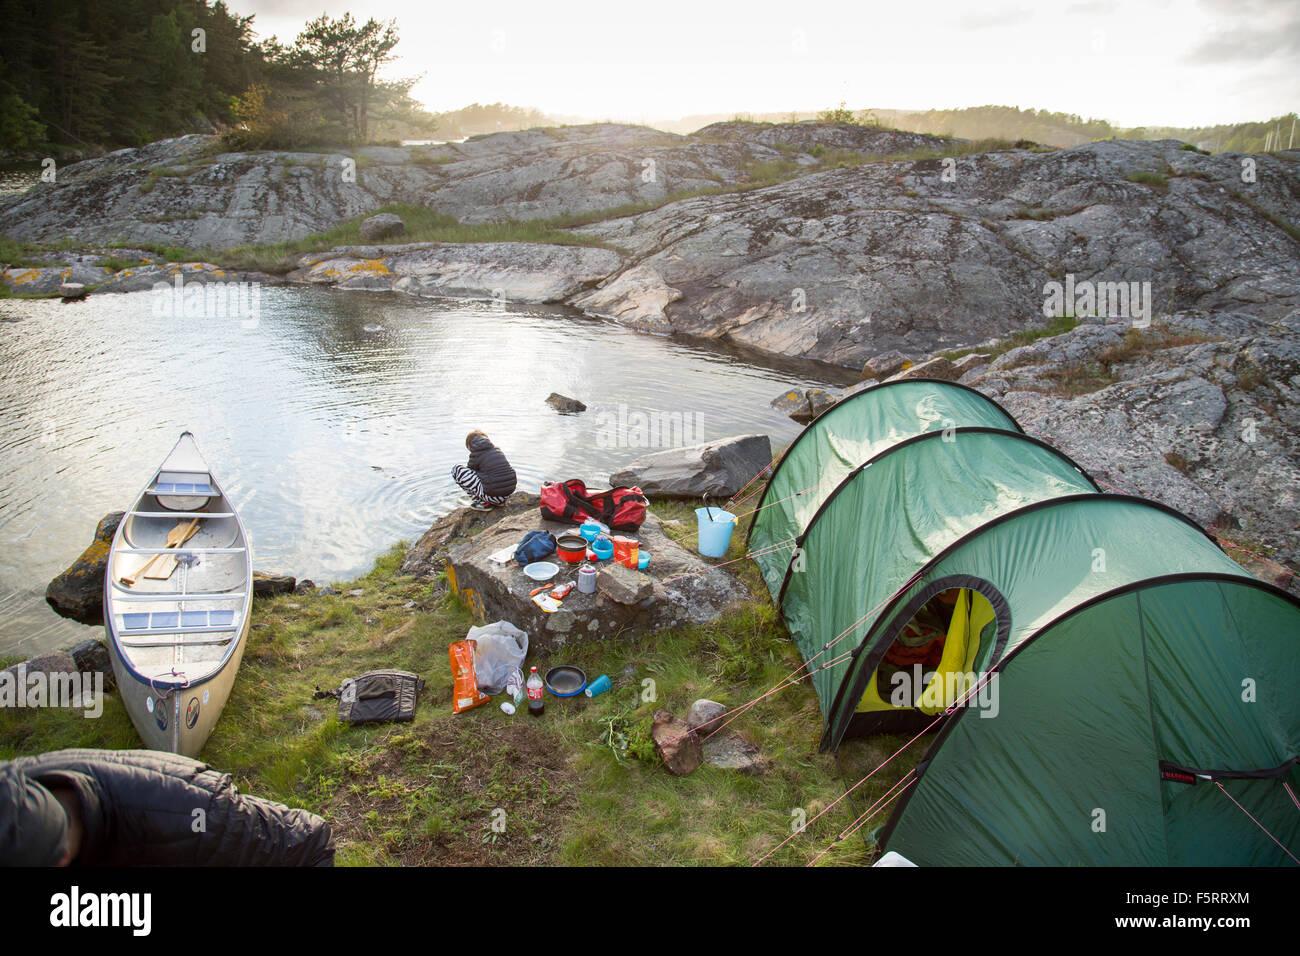 Sweden, West Coast, Bohuslan, Flato, Tent on rocky riverbank - Stock Image